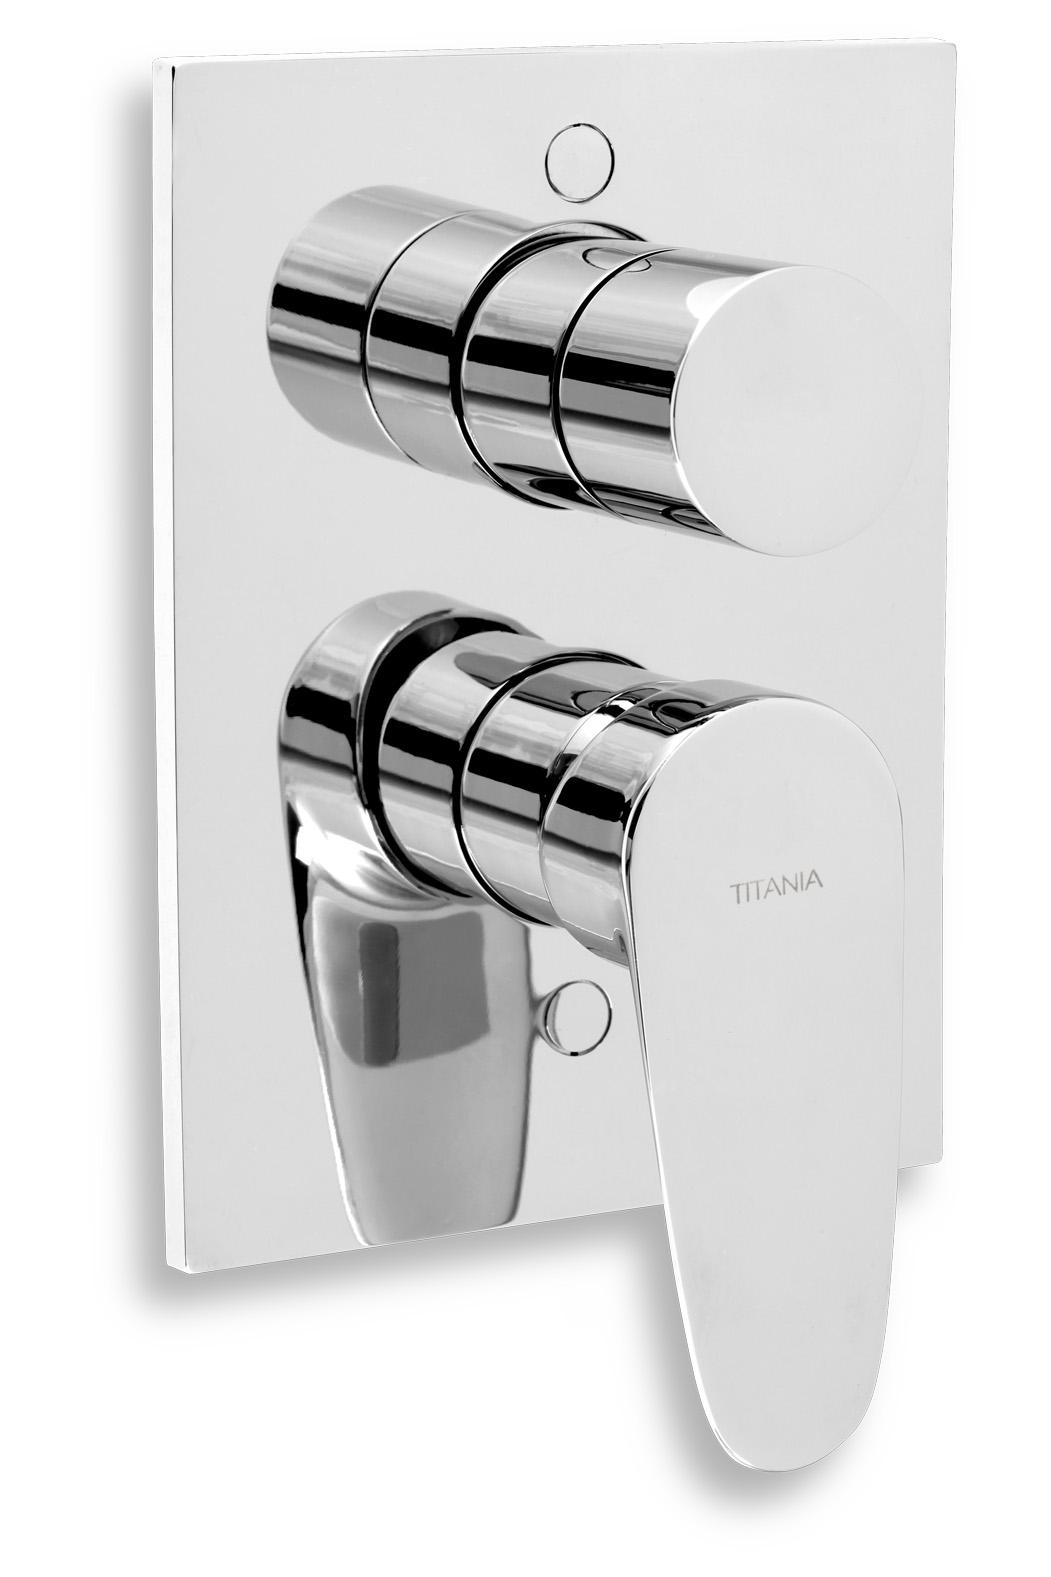 Vanová sprchová baterie s přepínačem Titania Smart chrom